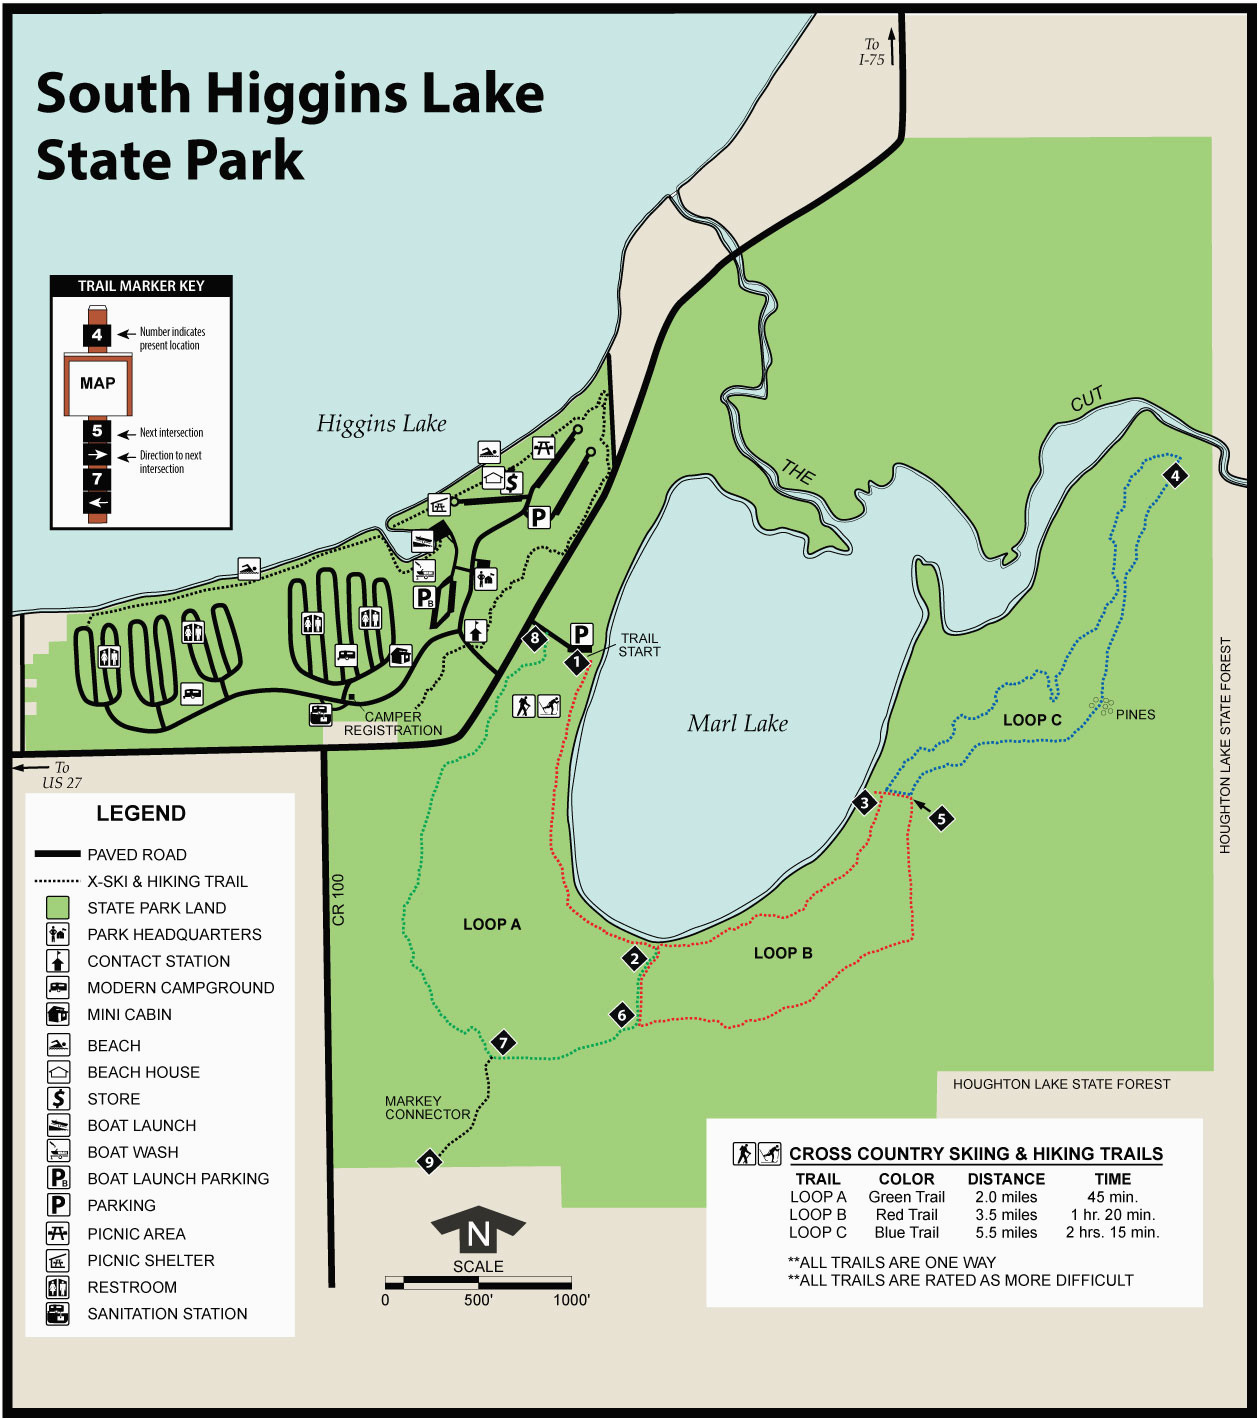 south higgins state parkmaps area guide shoreline visitors guide